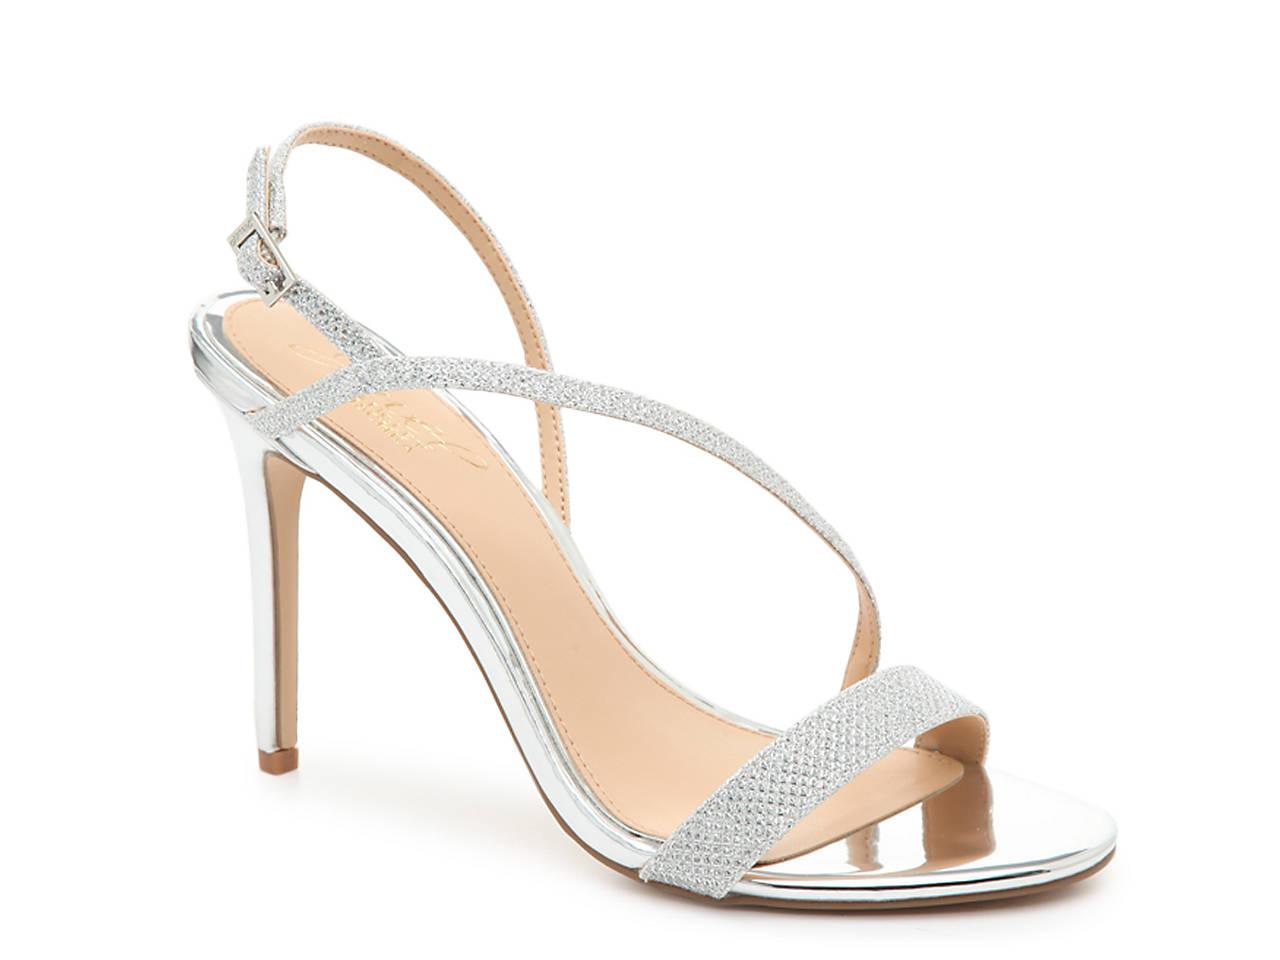 09db5aaf7 Jewel Badgley Mischka Gabriela Sandal Women's Shoes | DSW